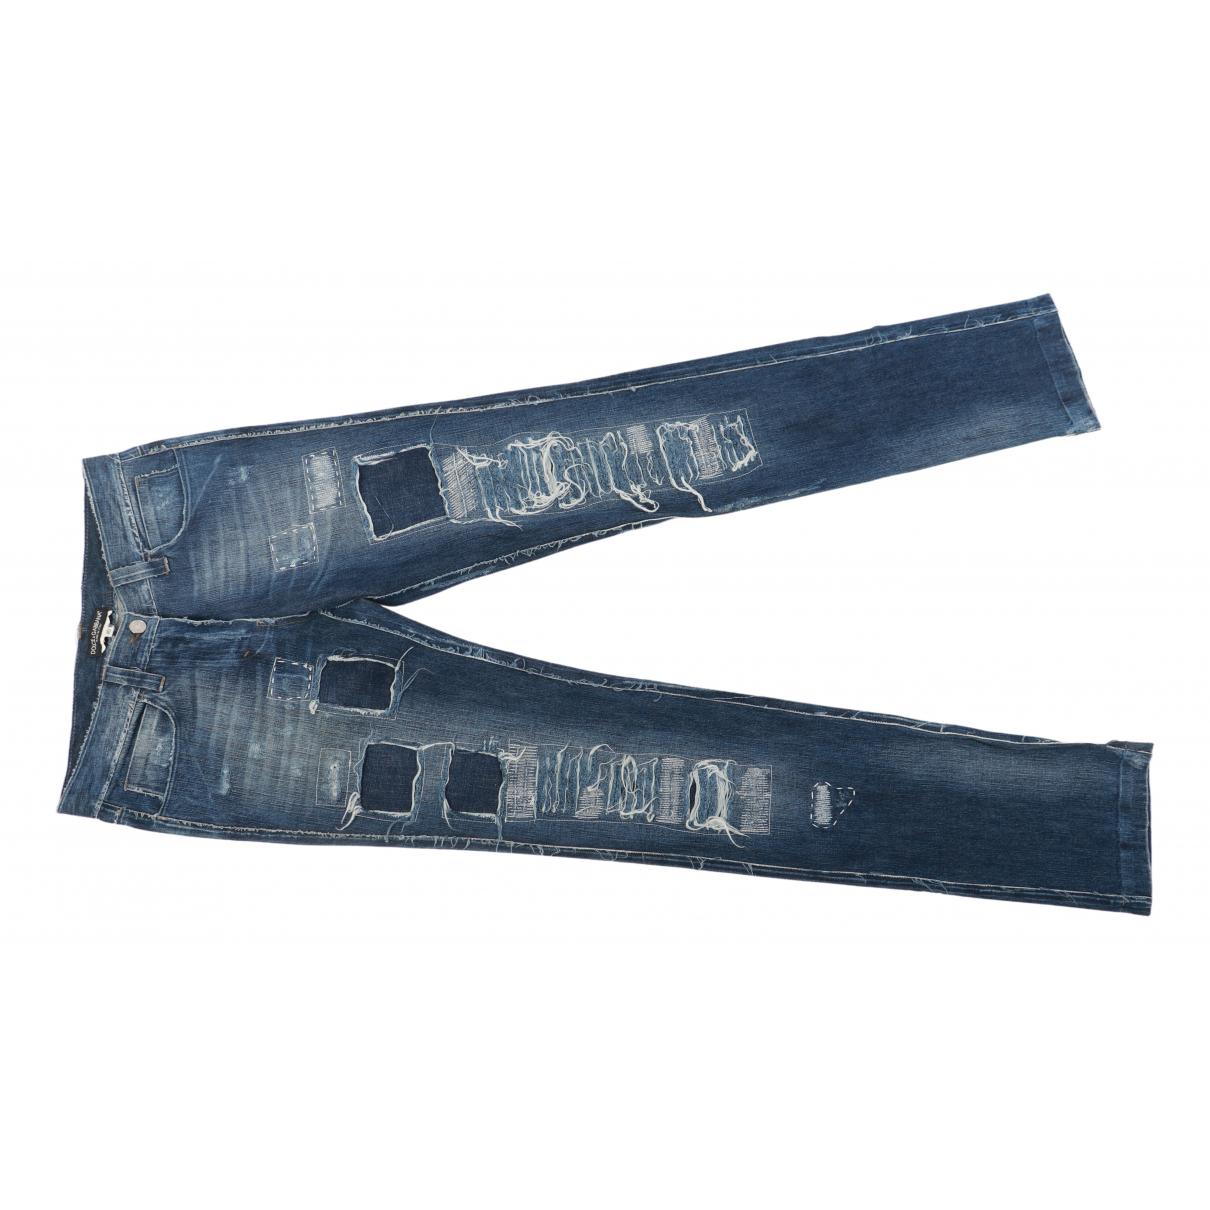 Dolce & Gabbana N Blue Cotton Jeans for Women 36 FR